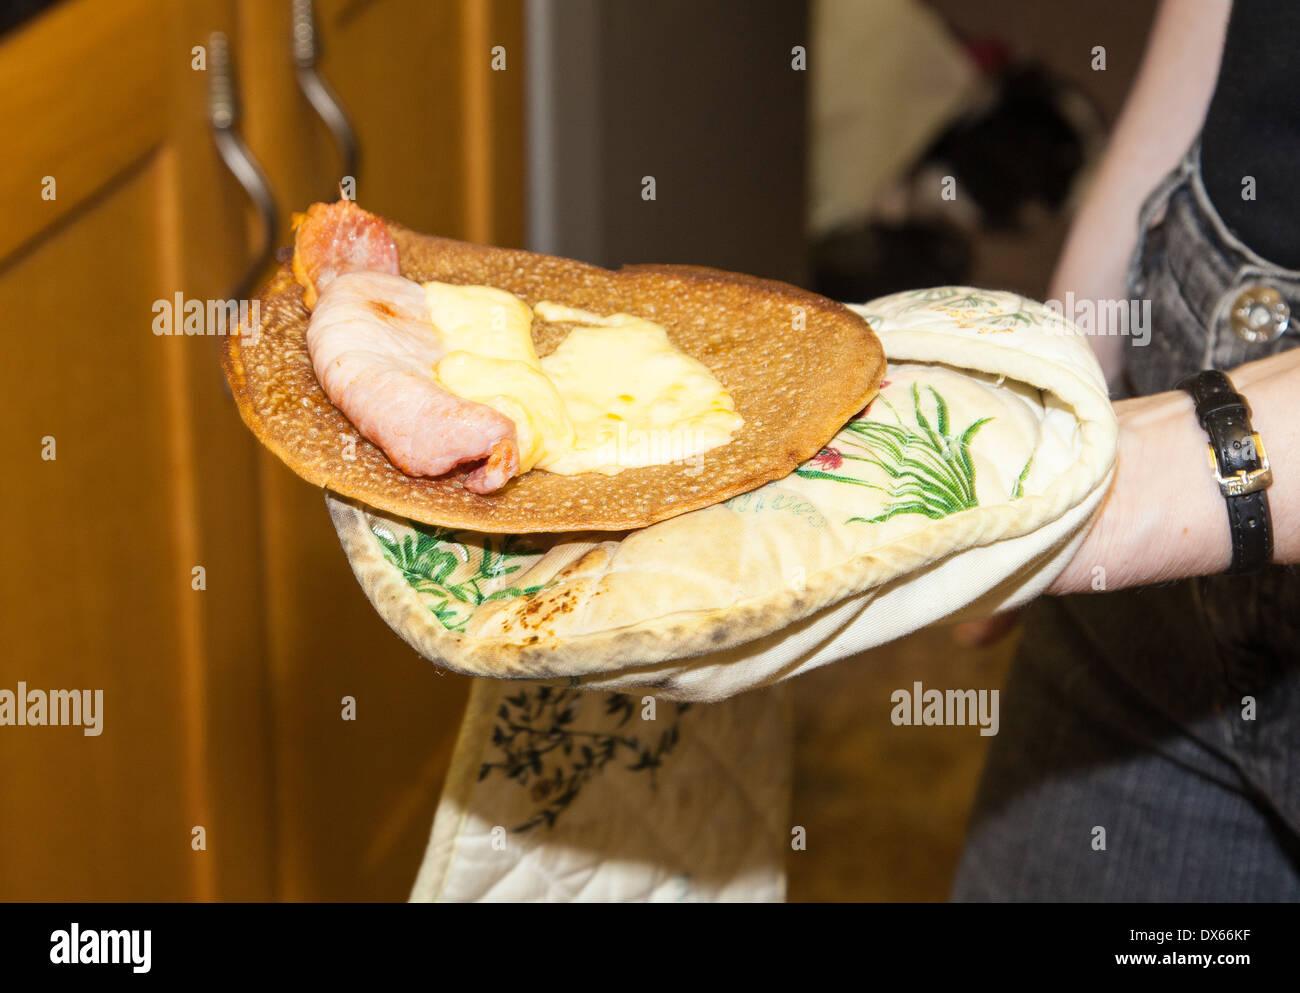 Savory Oat Cakes